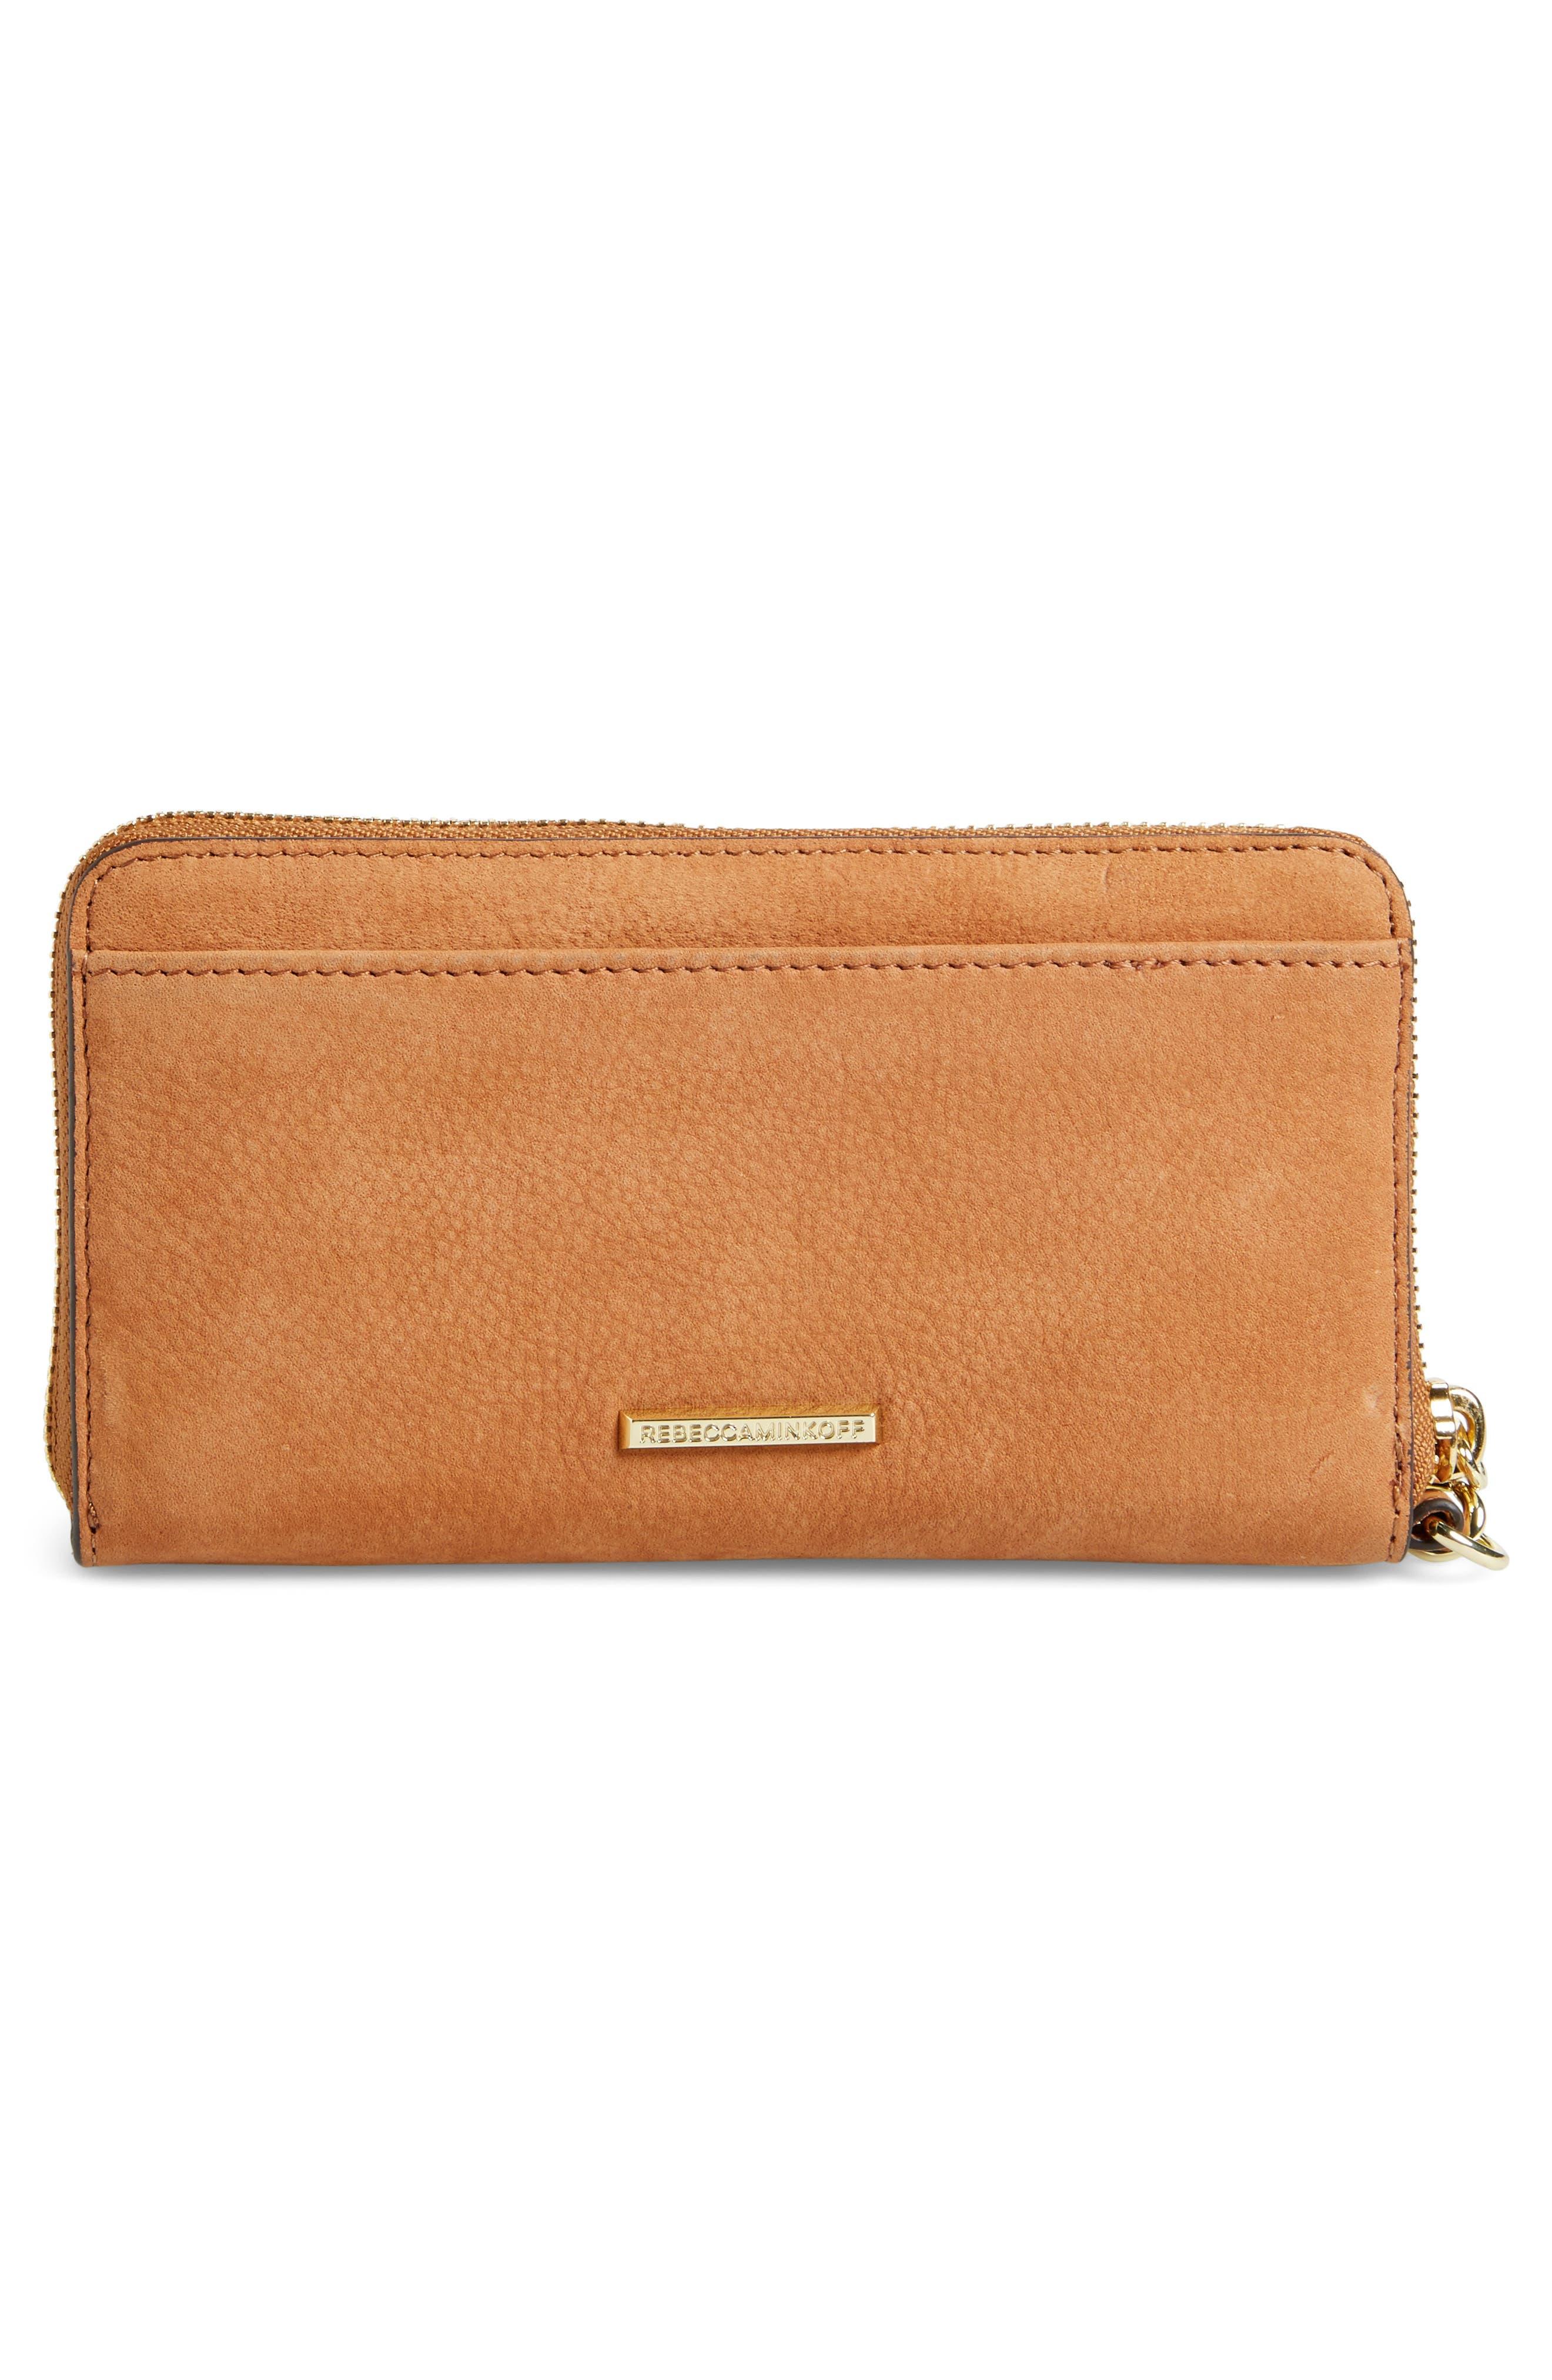 Vanity Nubuck Leather Phone Wallet,                             Alternate thumbnail 3, color,                             230